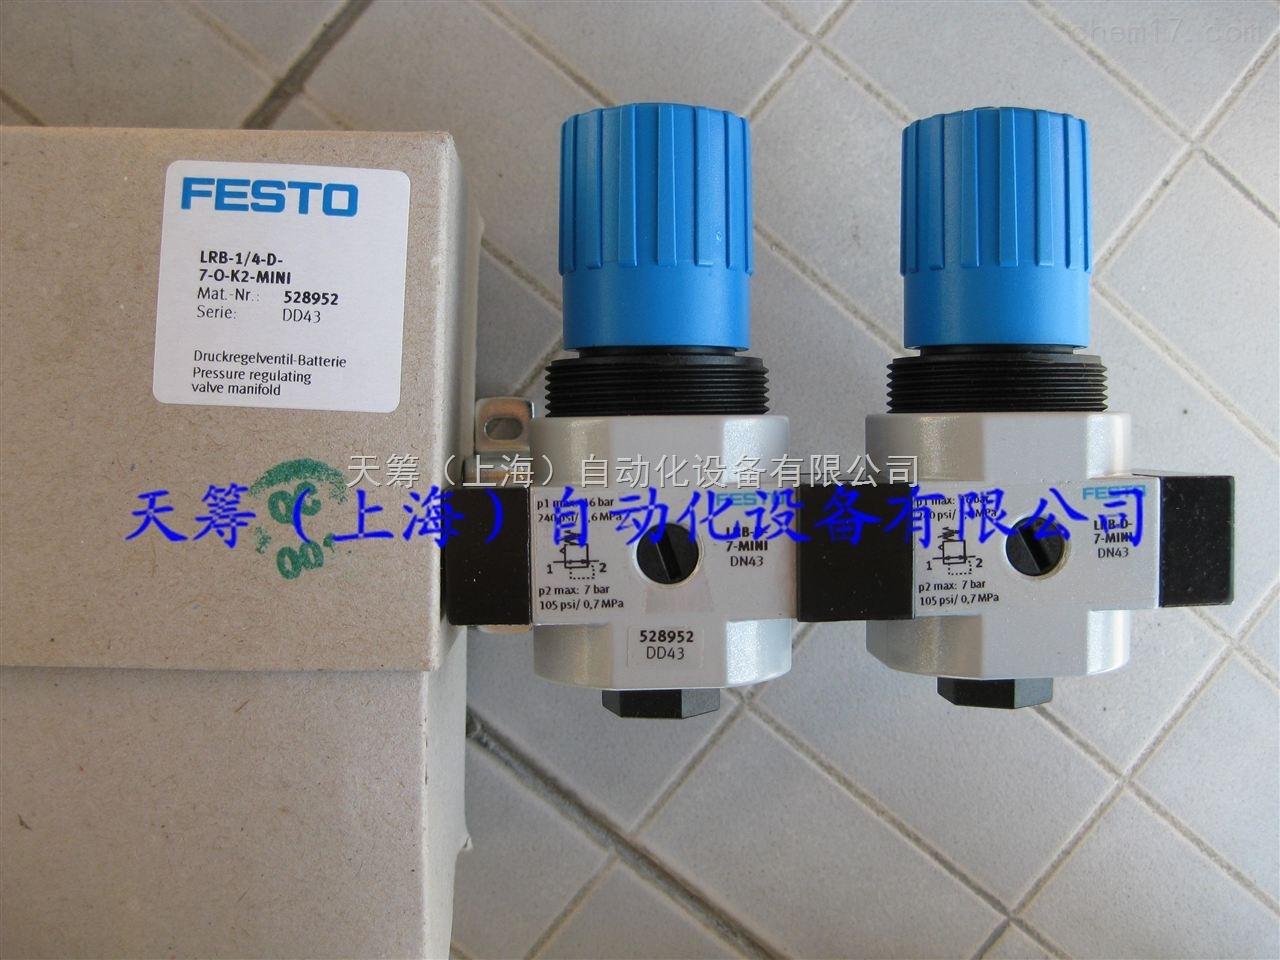 FESTO减压阀组件LRB-1/4-D-7-O-K2-MIN